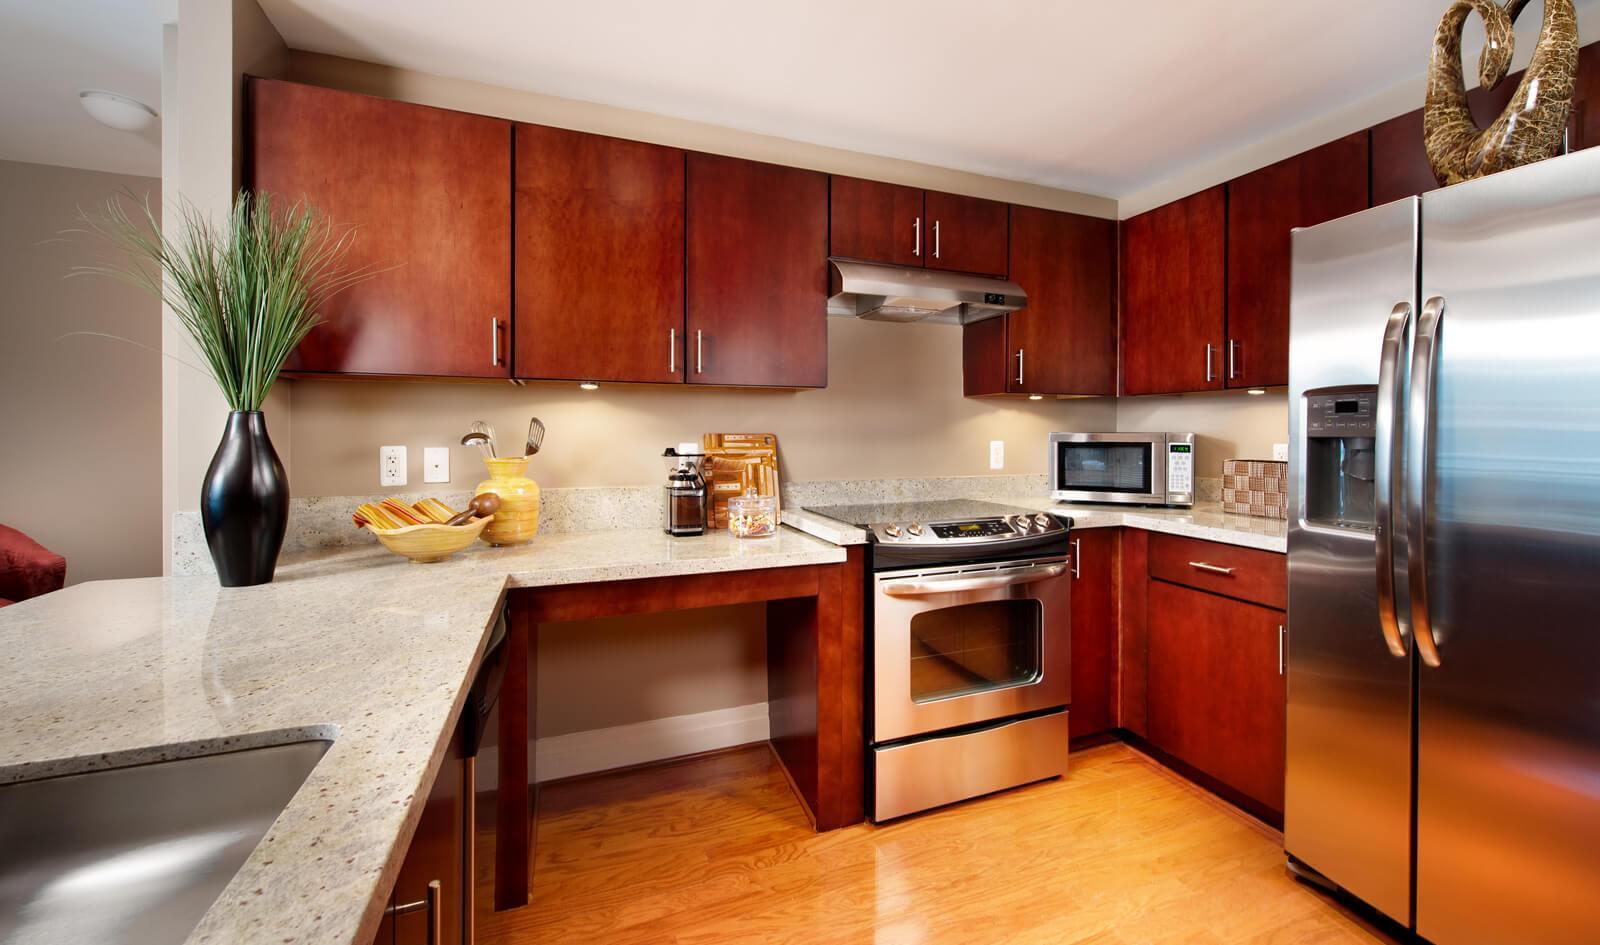 slide image Enjoy Kashmire white granite countertops, Merillat Sedona cabinetry and GE Stainless Steel appliances.